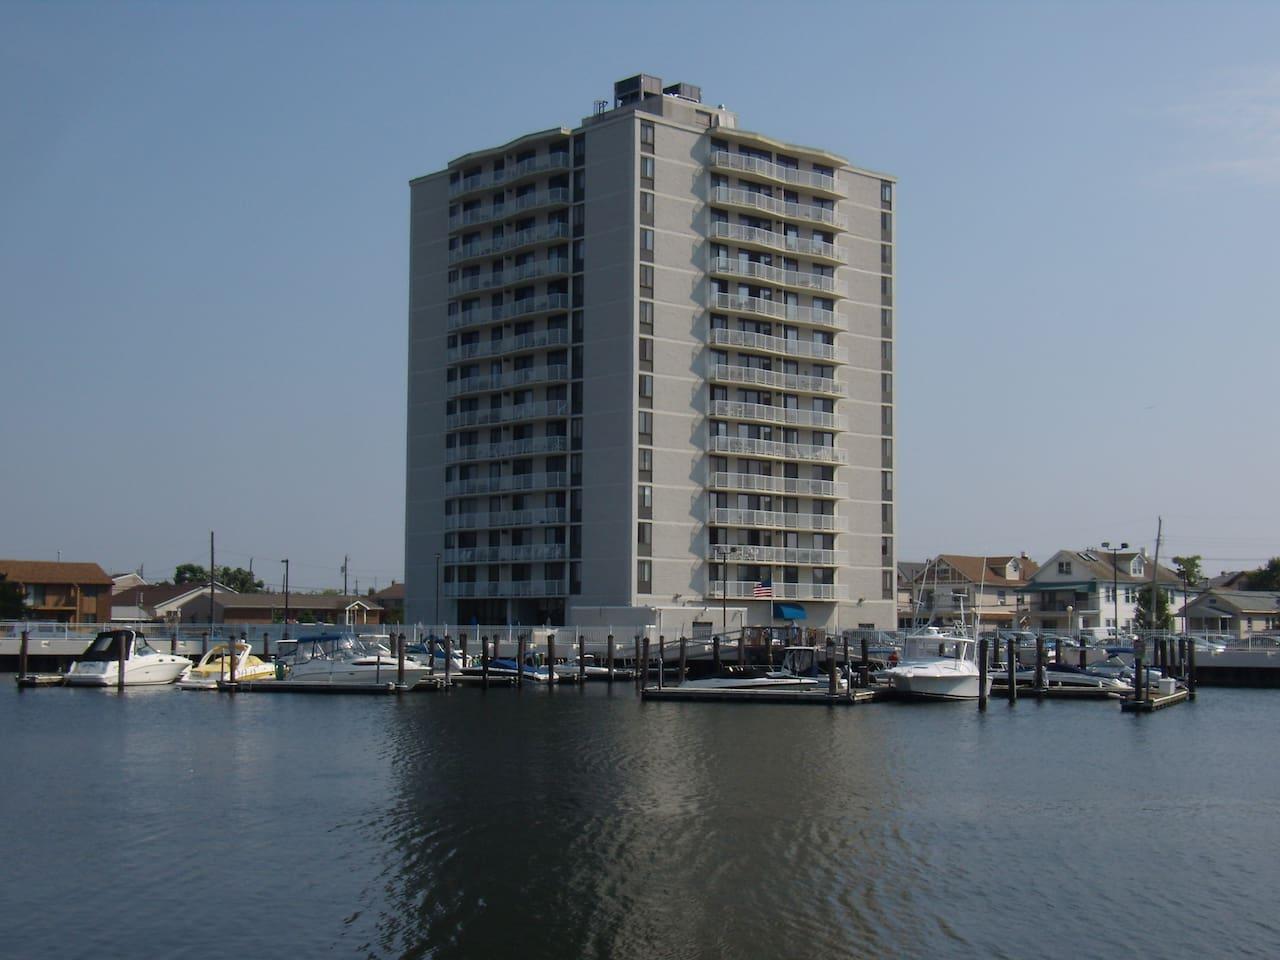 Sunset Harbour Condominiums and Marina